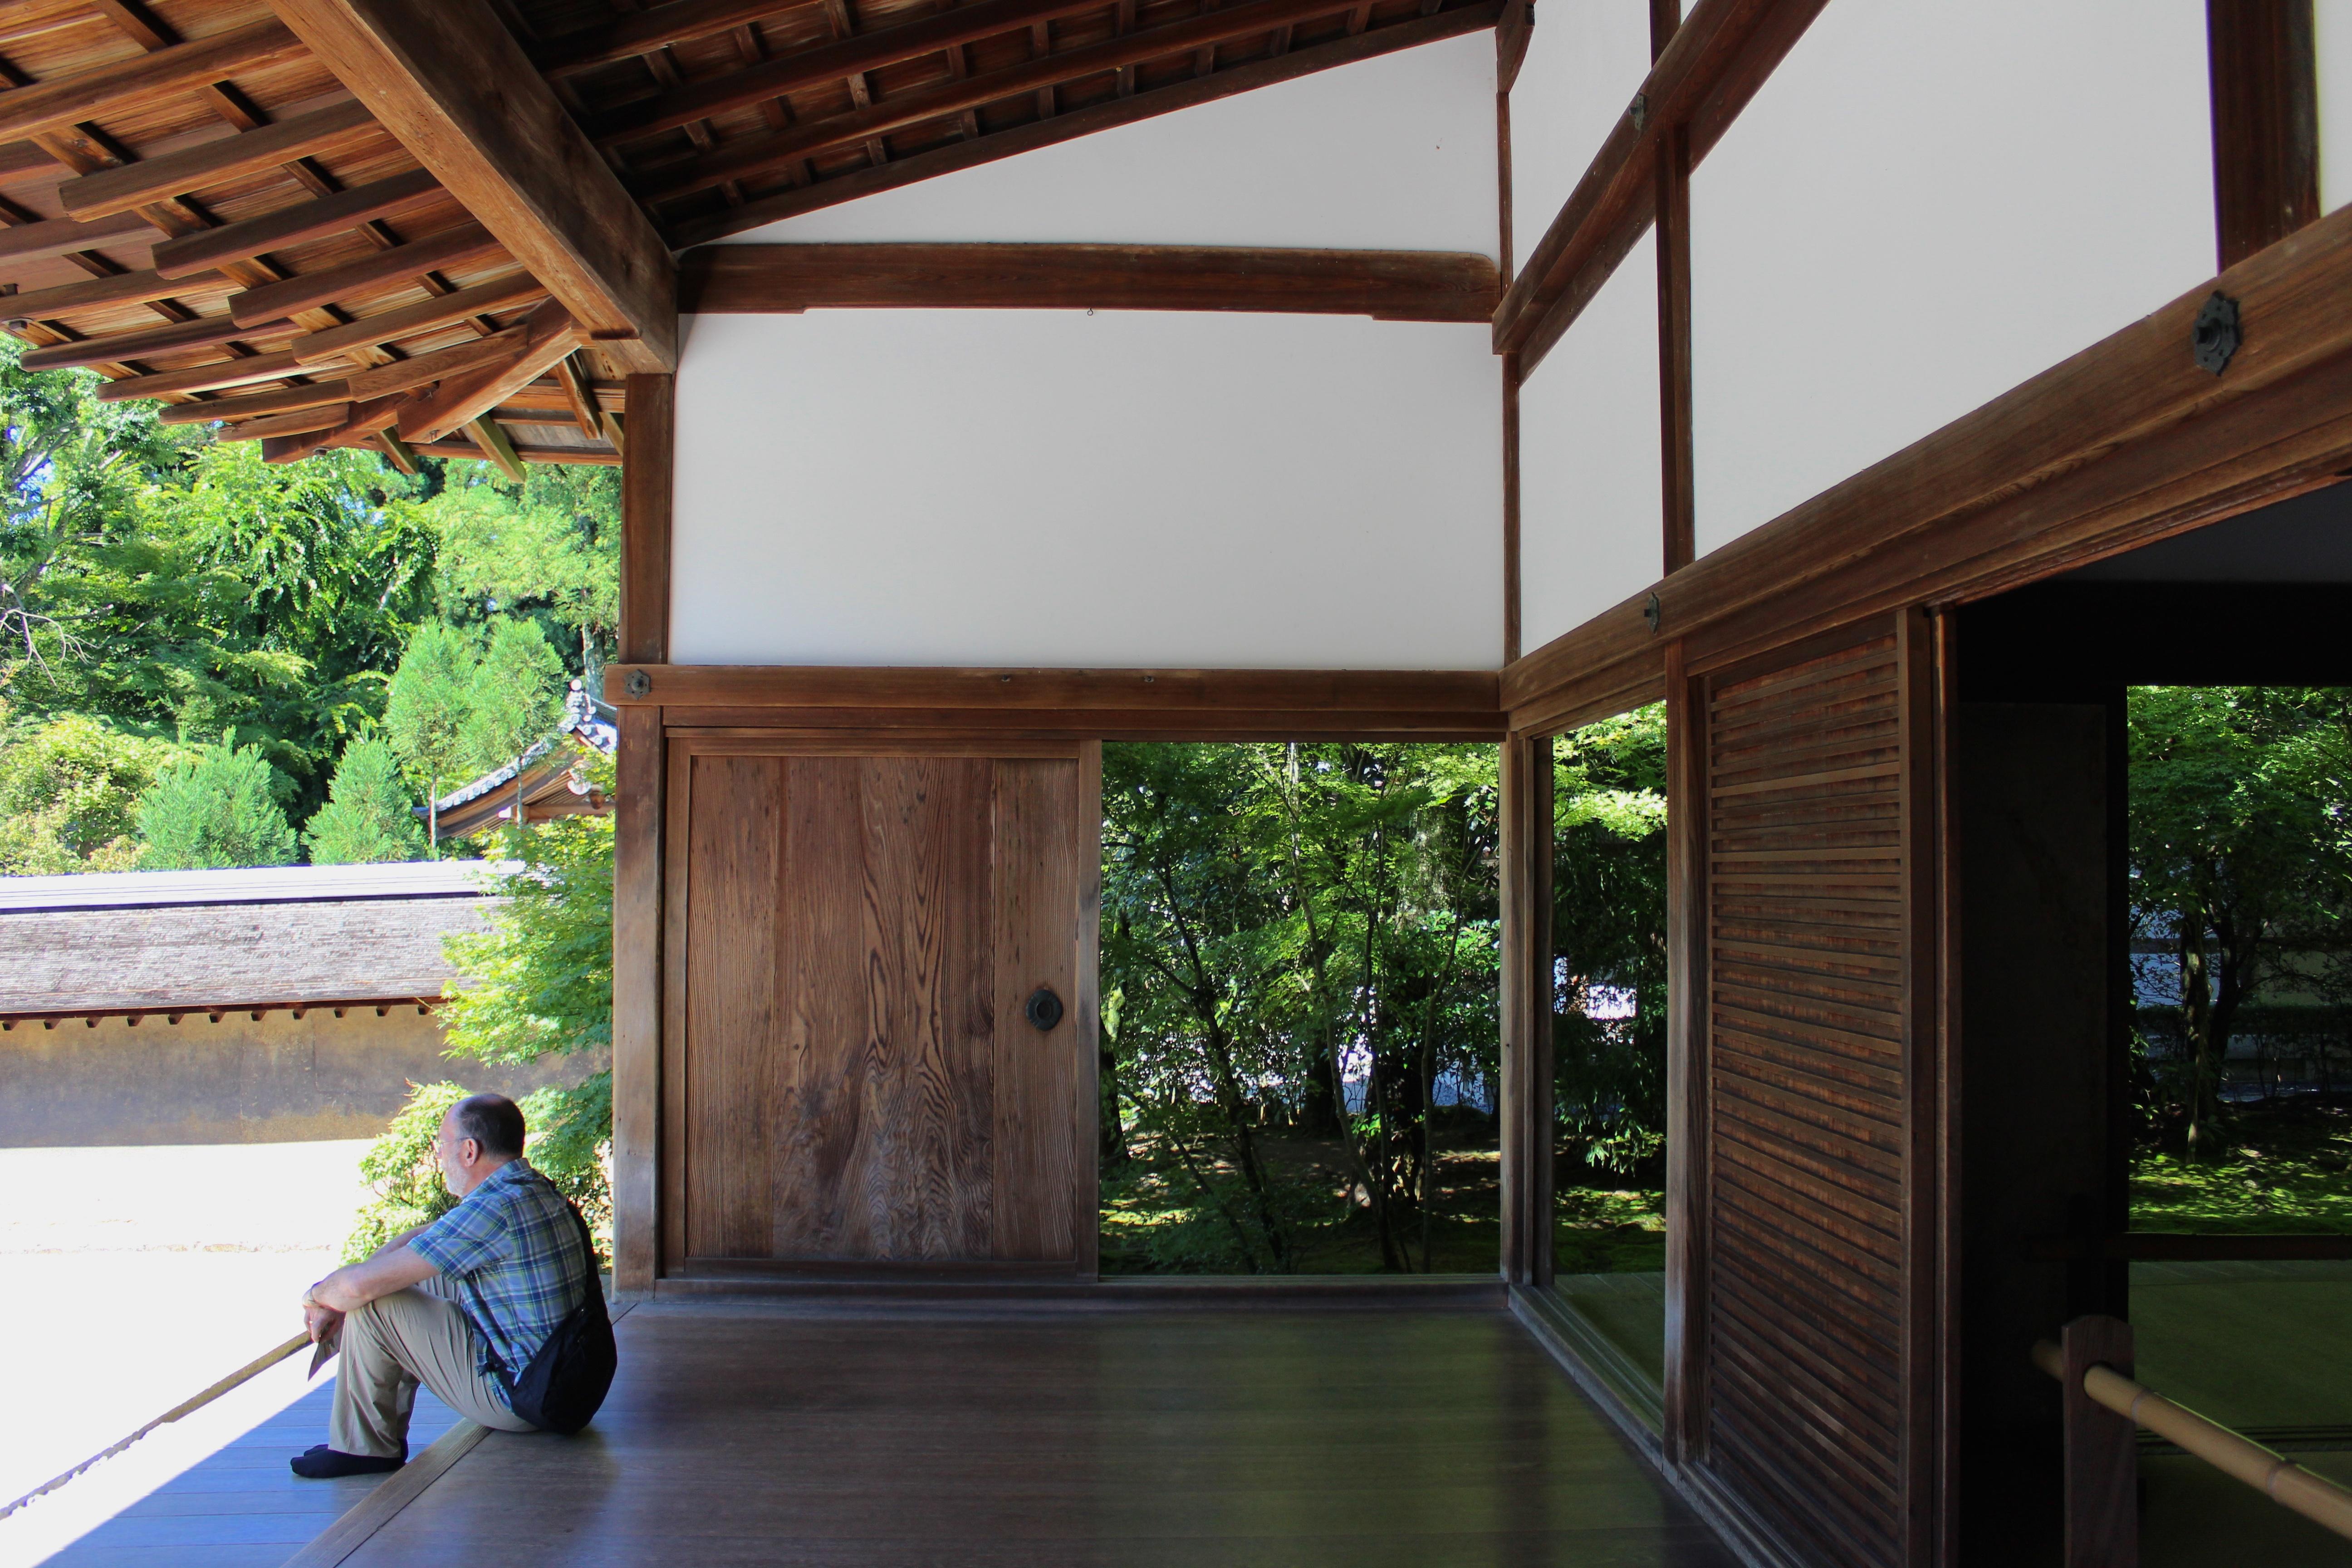 Fotos gratis arquitectura cubierta madera villa casa - Pergolas de troncos ...